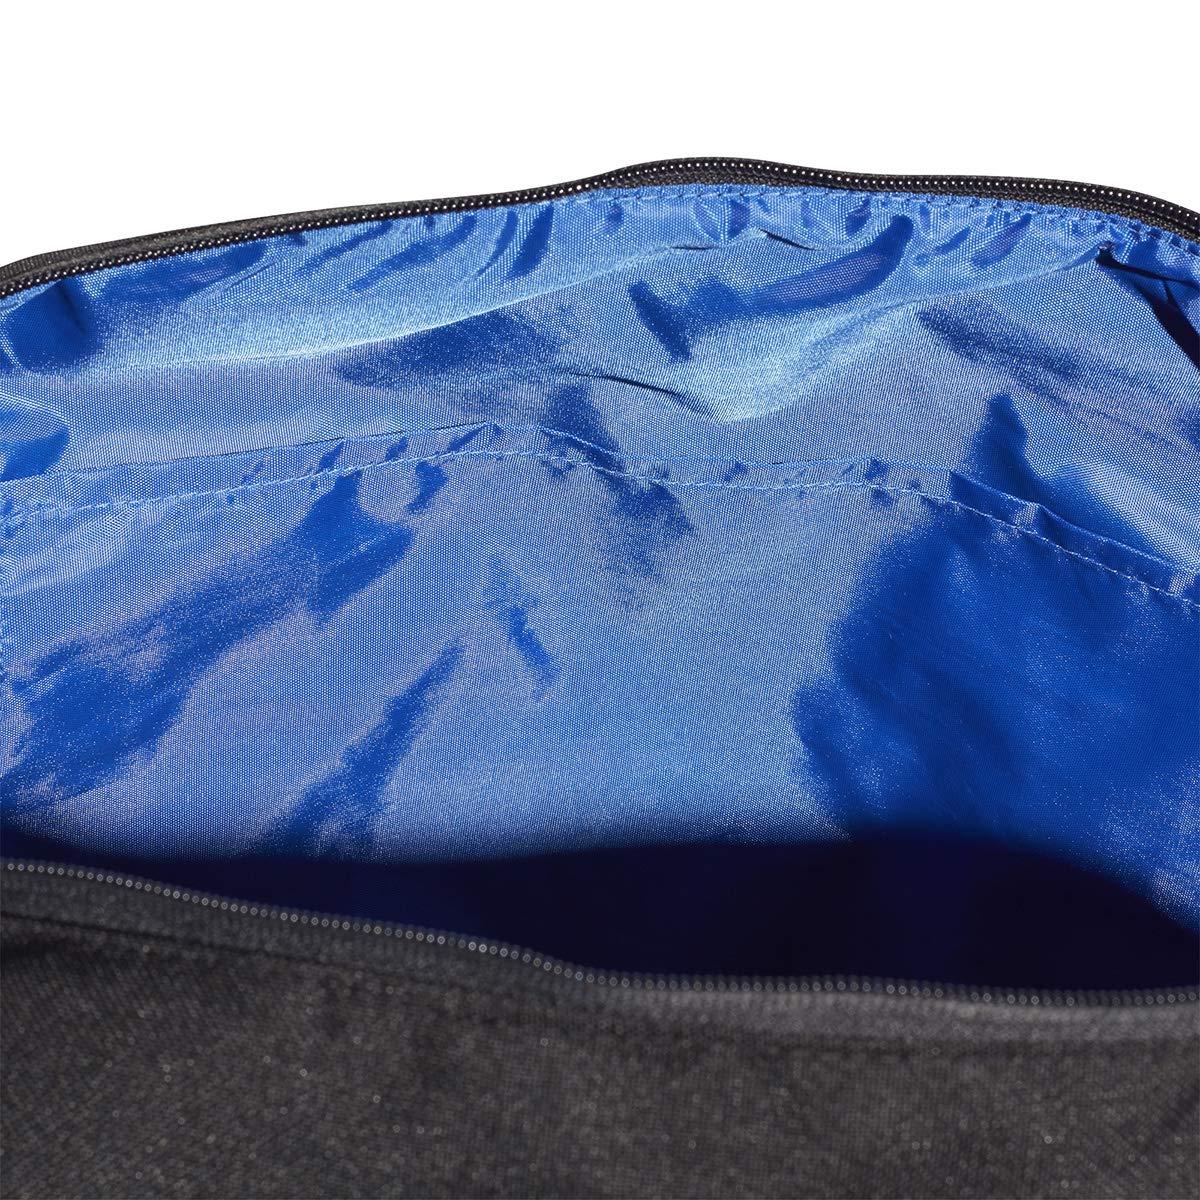 Adidas cg1522Borsa a Mano Unisex Adulto, Nero, Dimensioni: 17x 38x 44cm ADIFO|#adidas